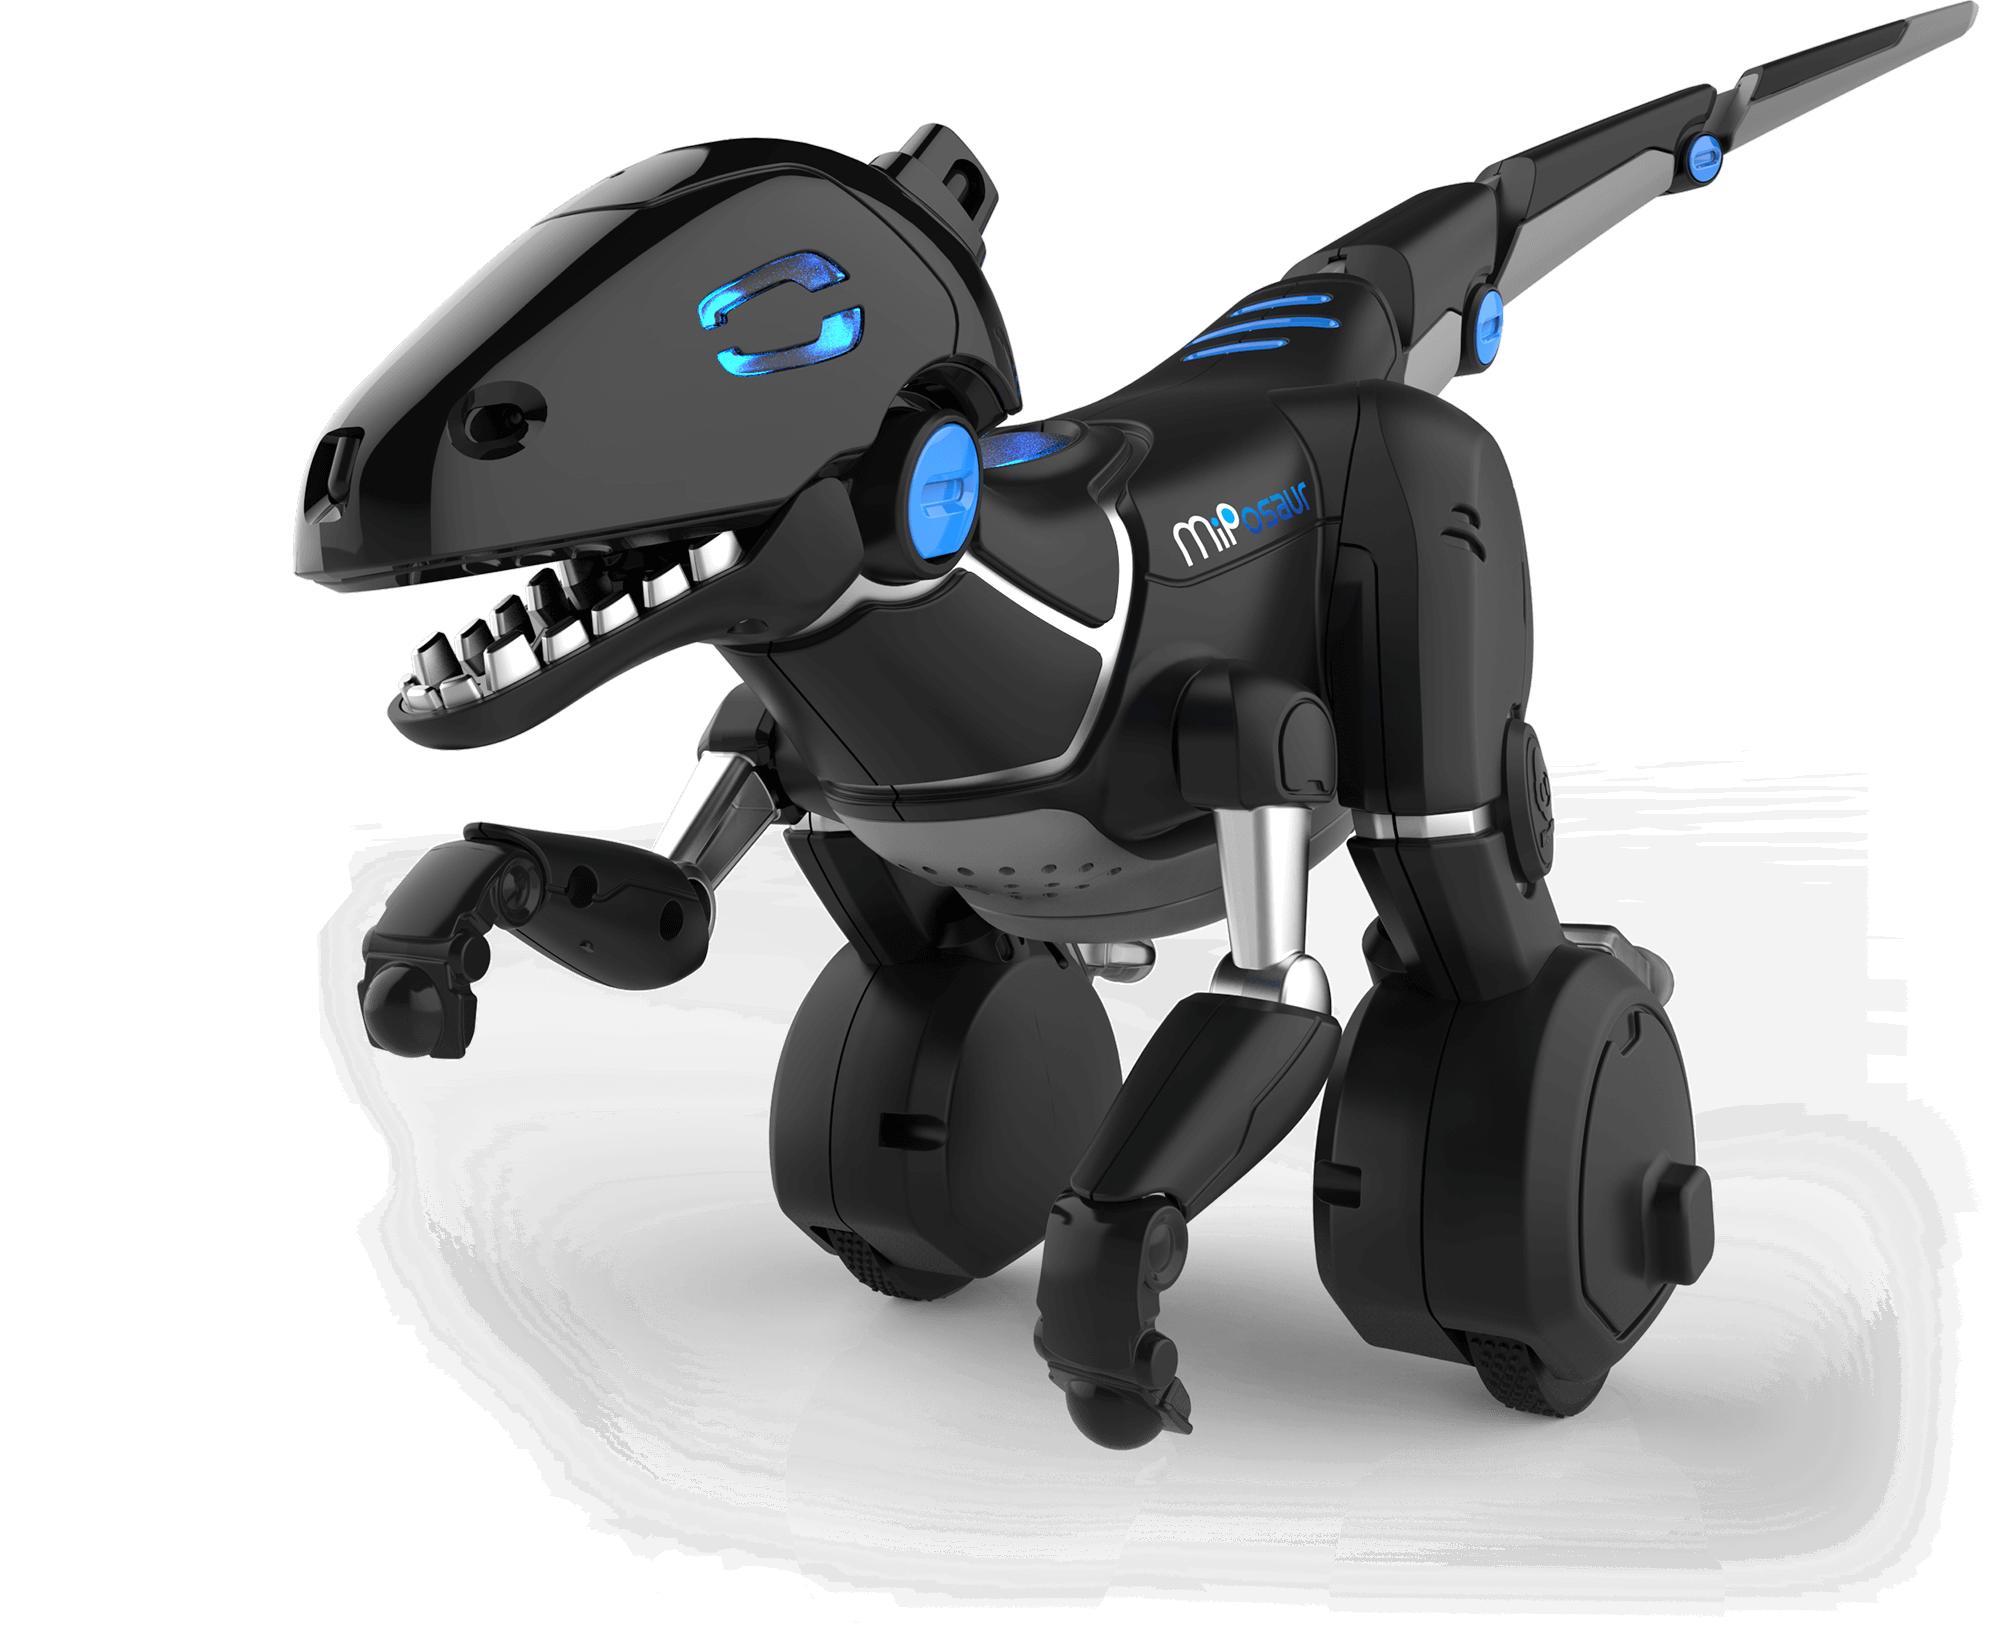 MiPosaur Robotic Dinosaur Pet